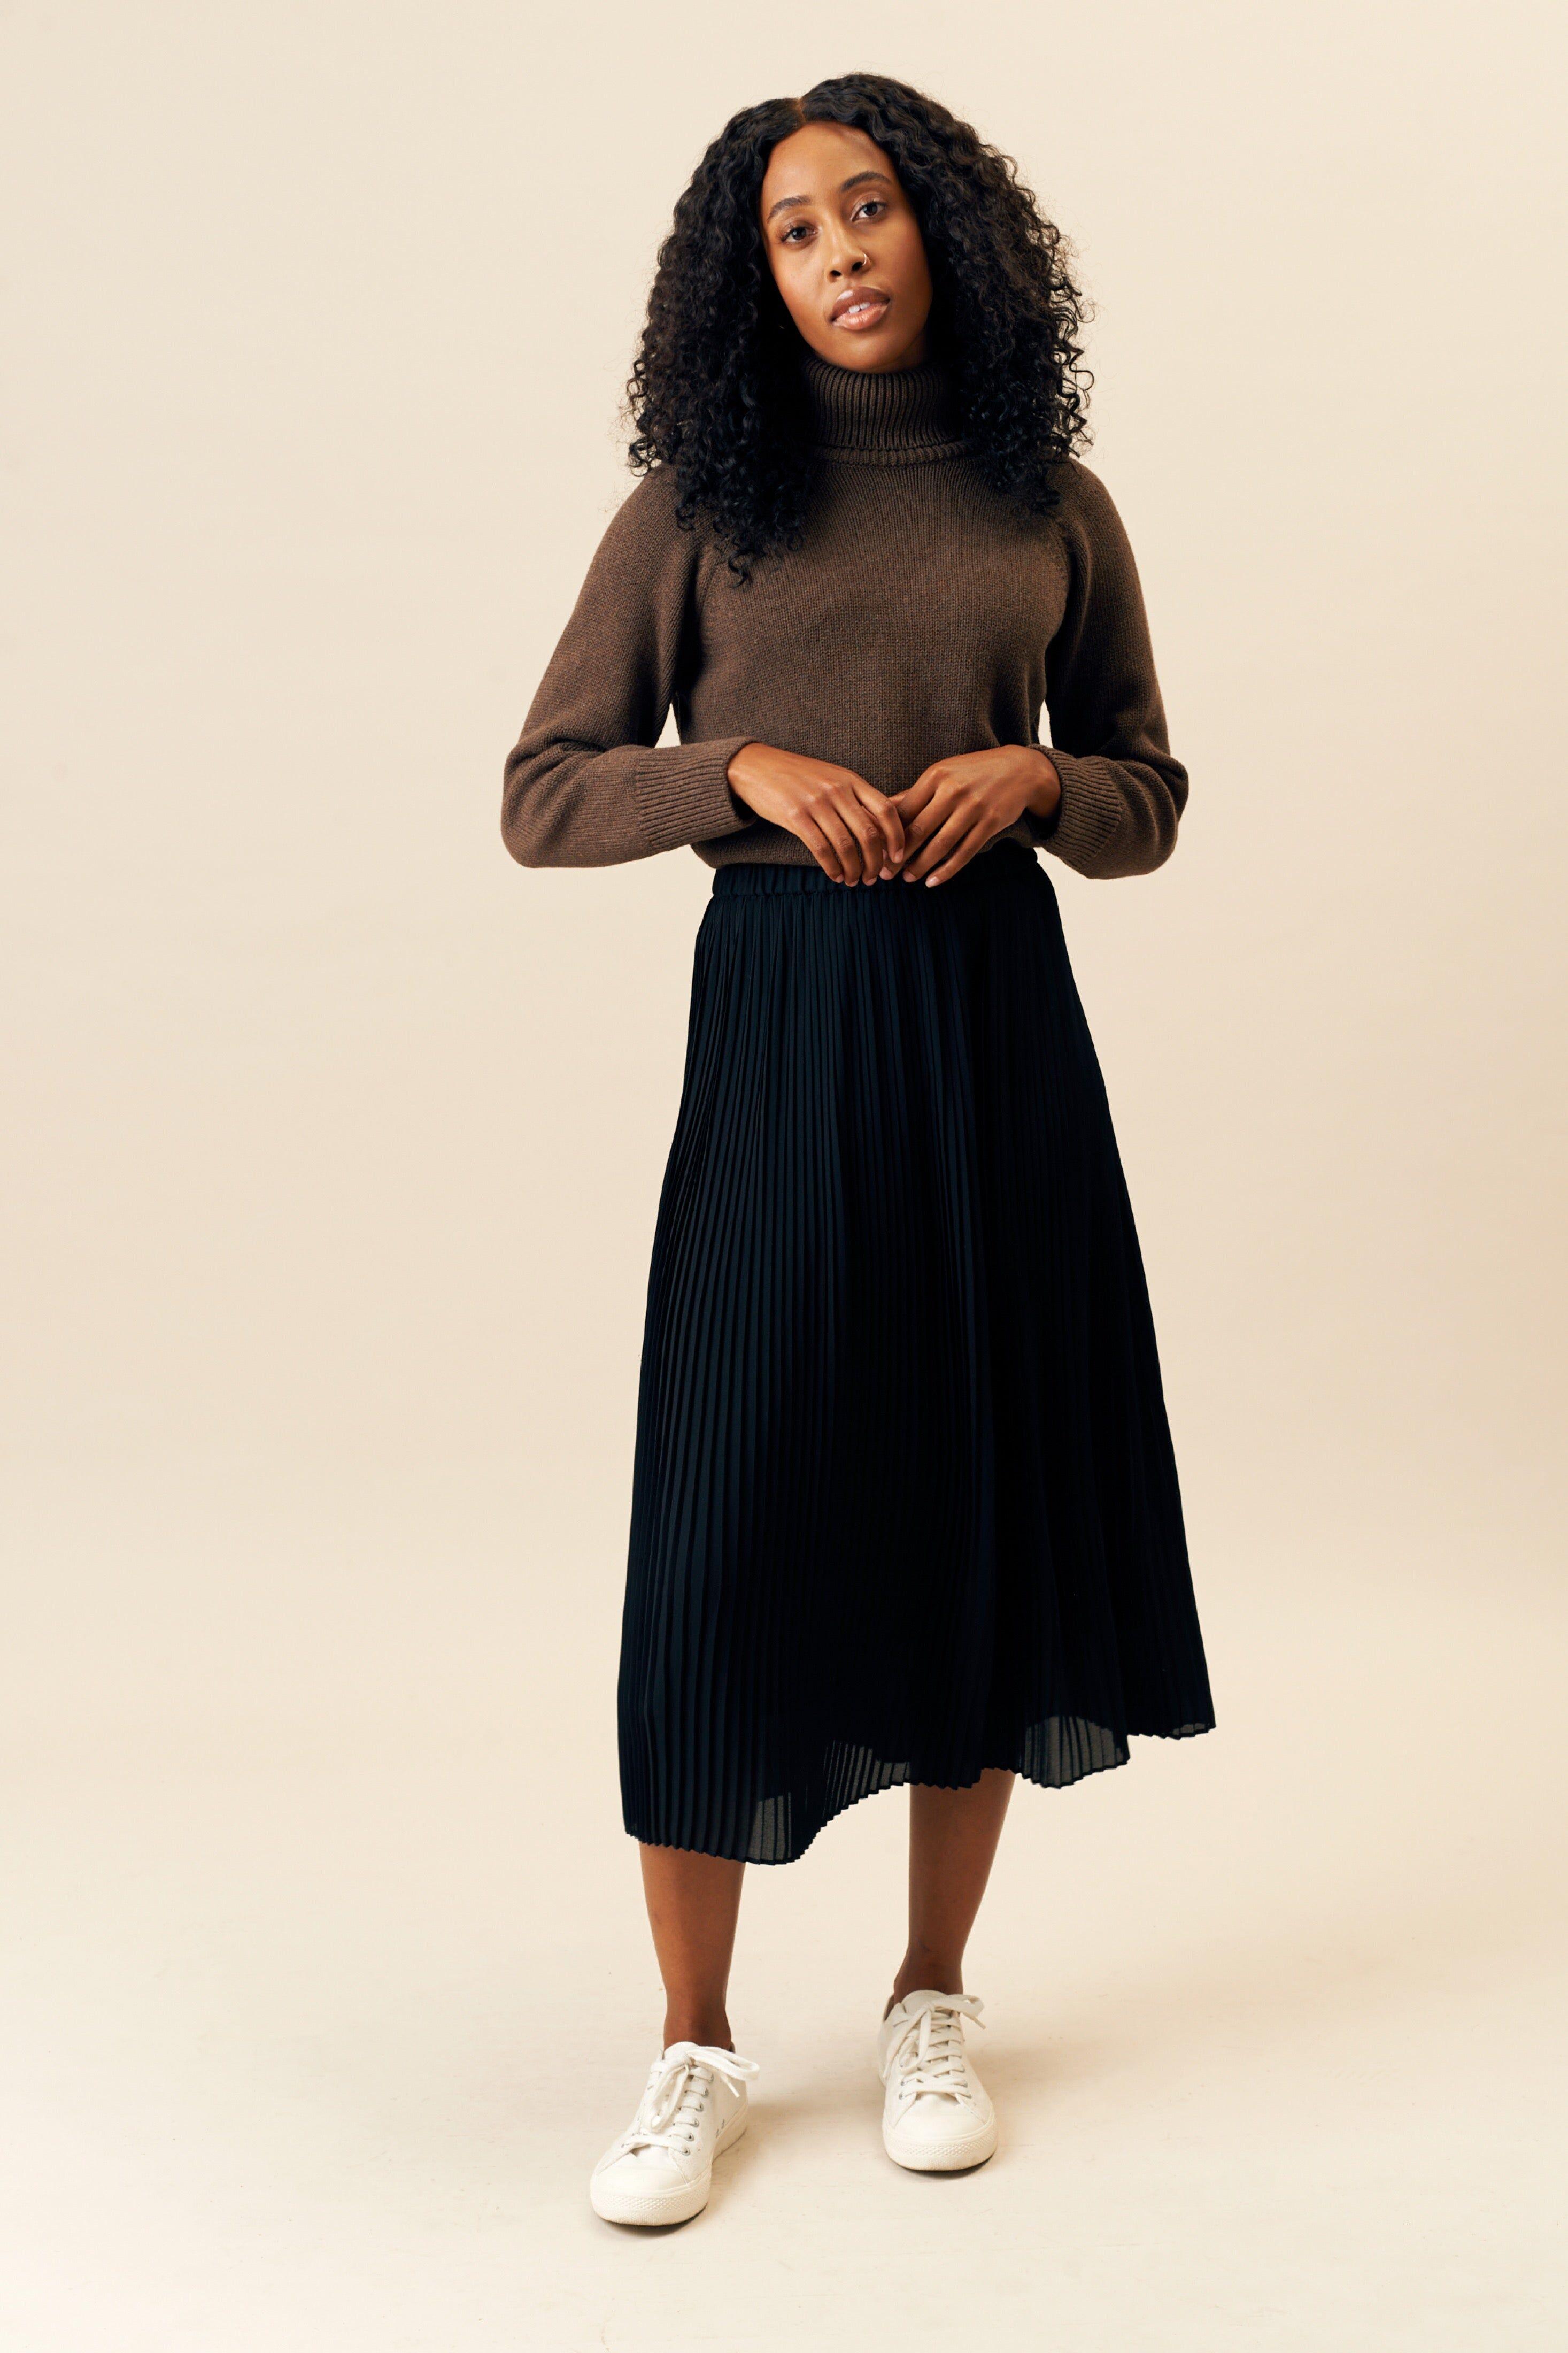 Kotn Women's Turtleneck Top Sweater in Chestnut Brown, Size Medium